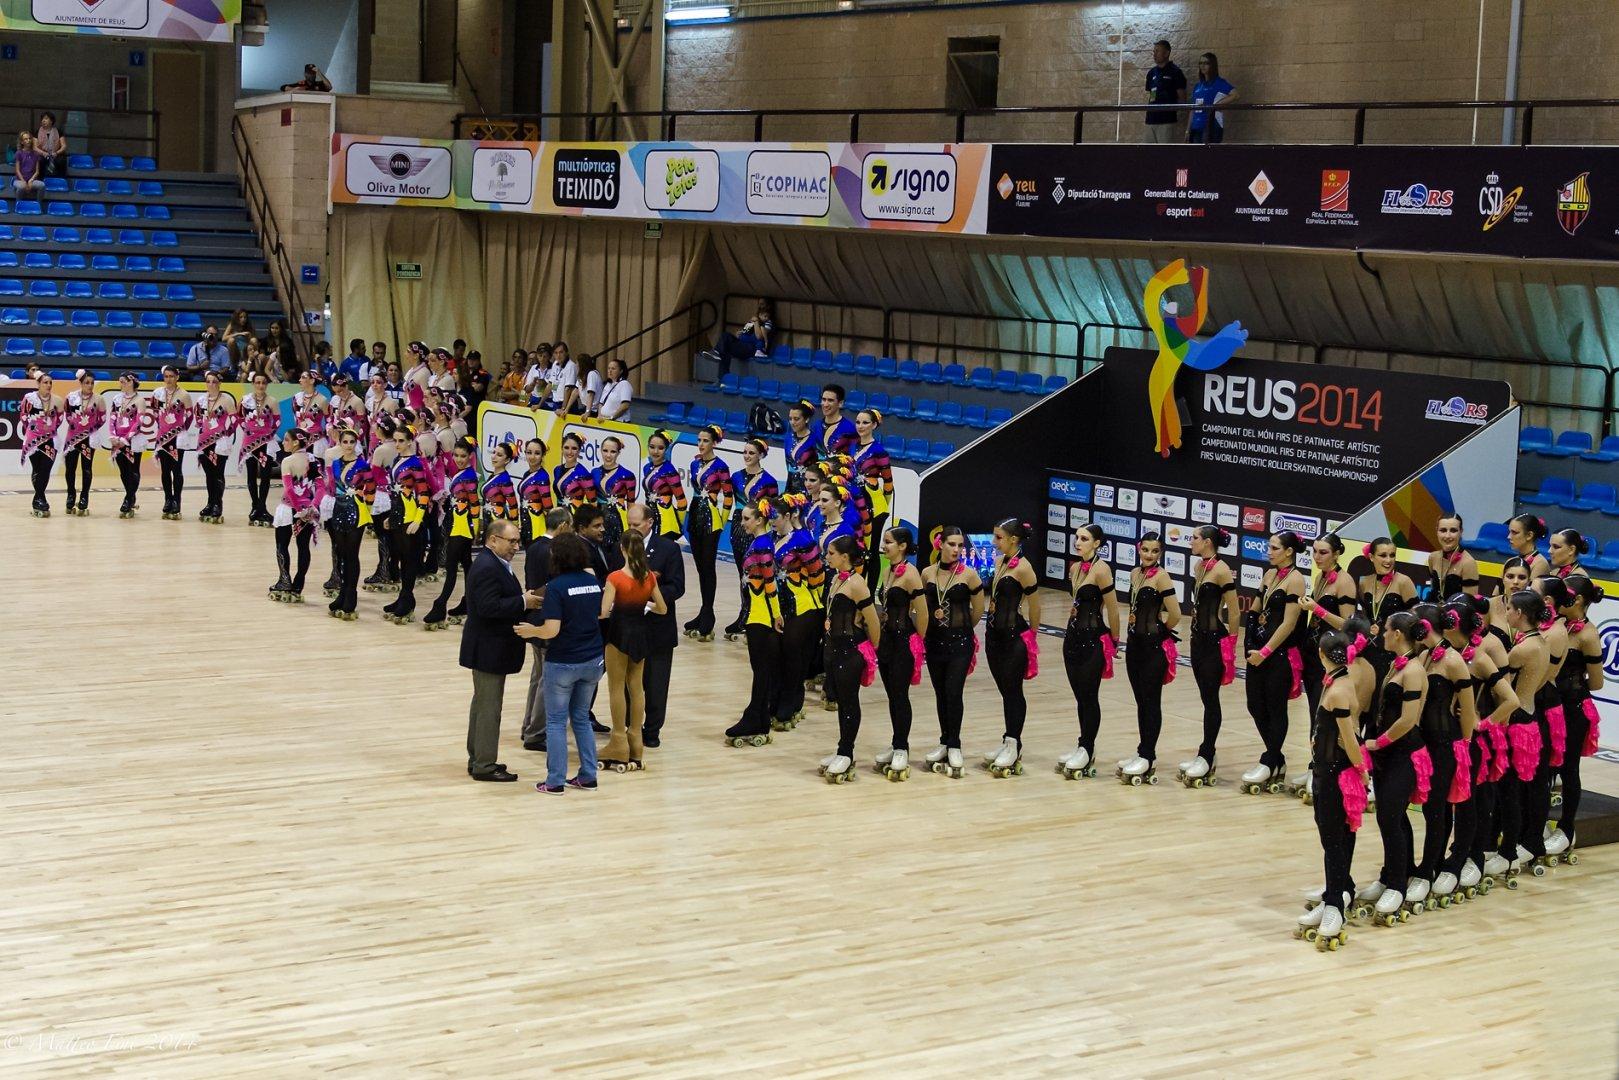 Campionato Mondiale Reus 2014 9